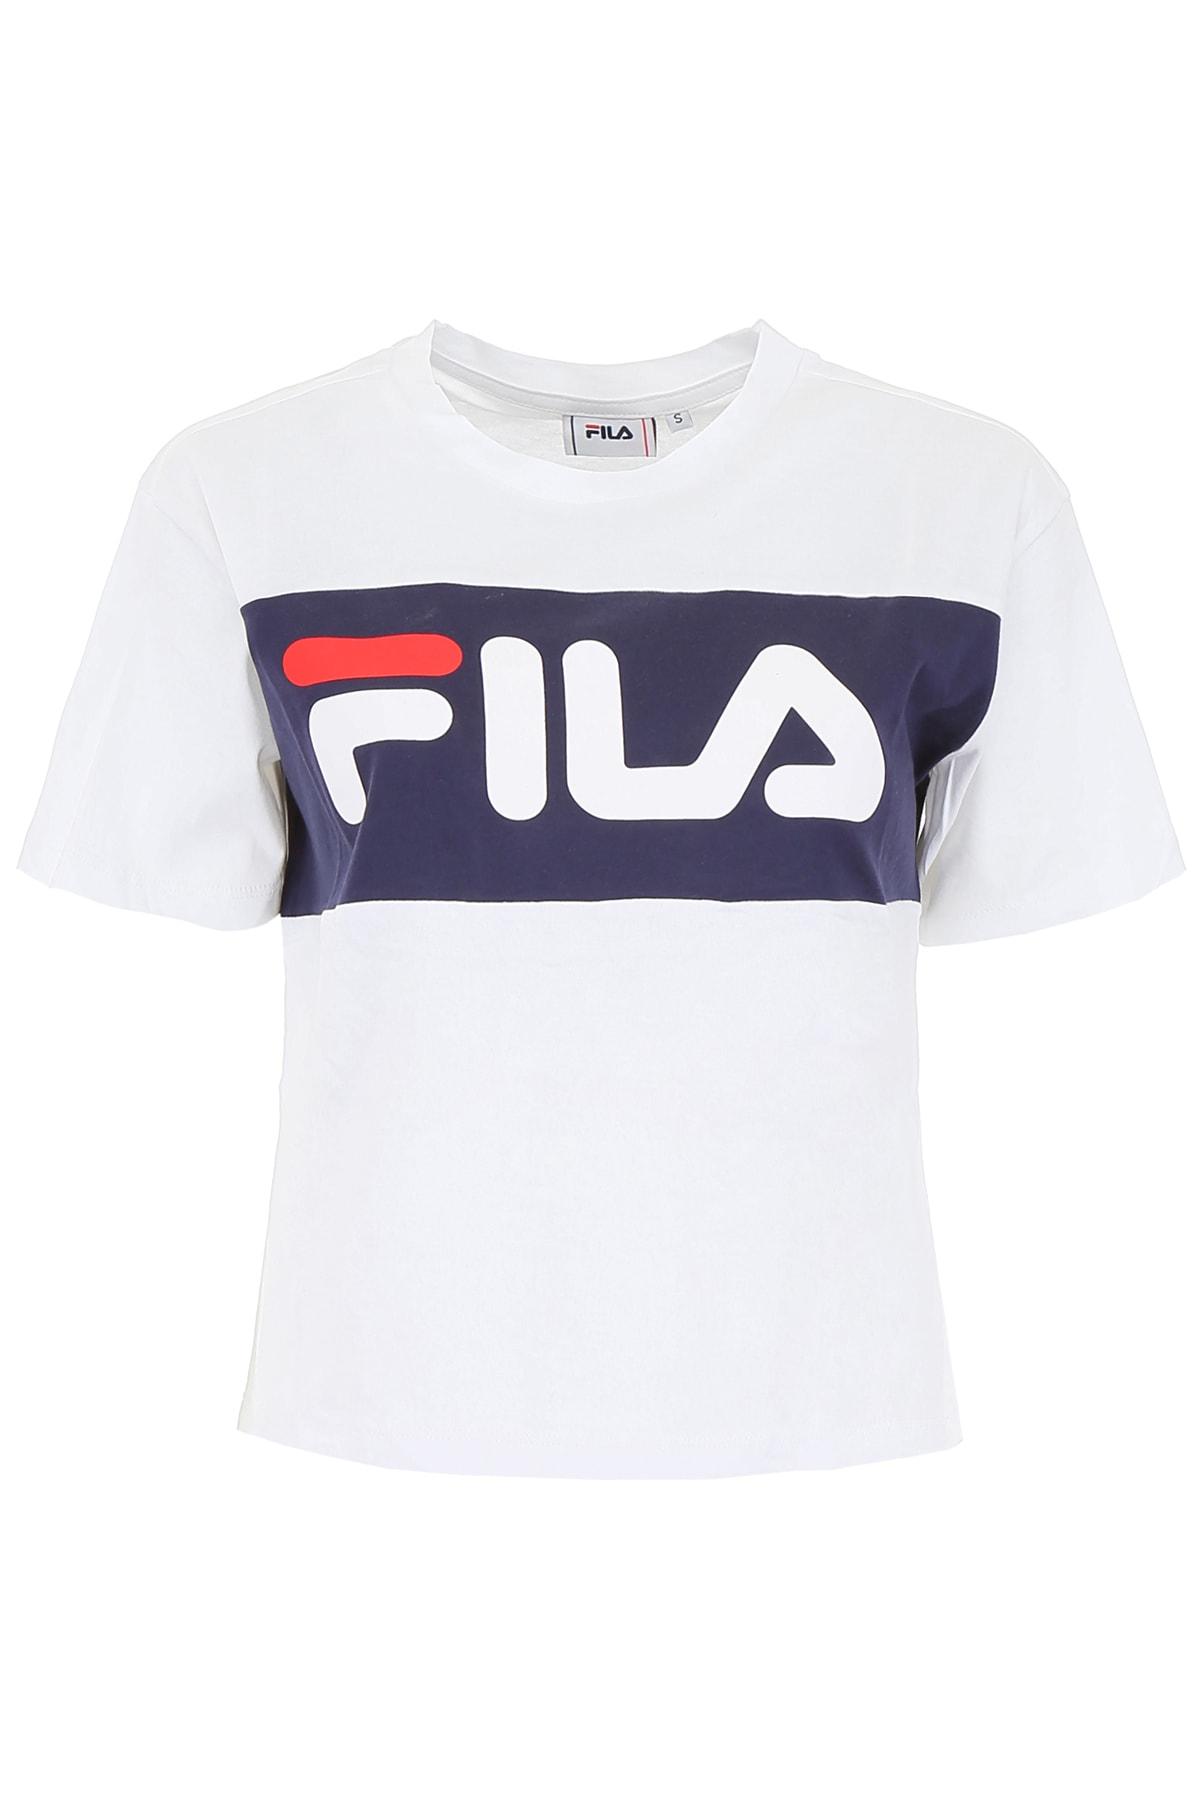 6eade8d2 Fila Fila Allison Logo T-shirt - BRIGHT WHITE BLACK IRIS (White ...